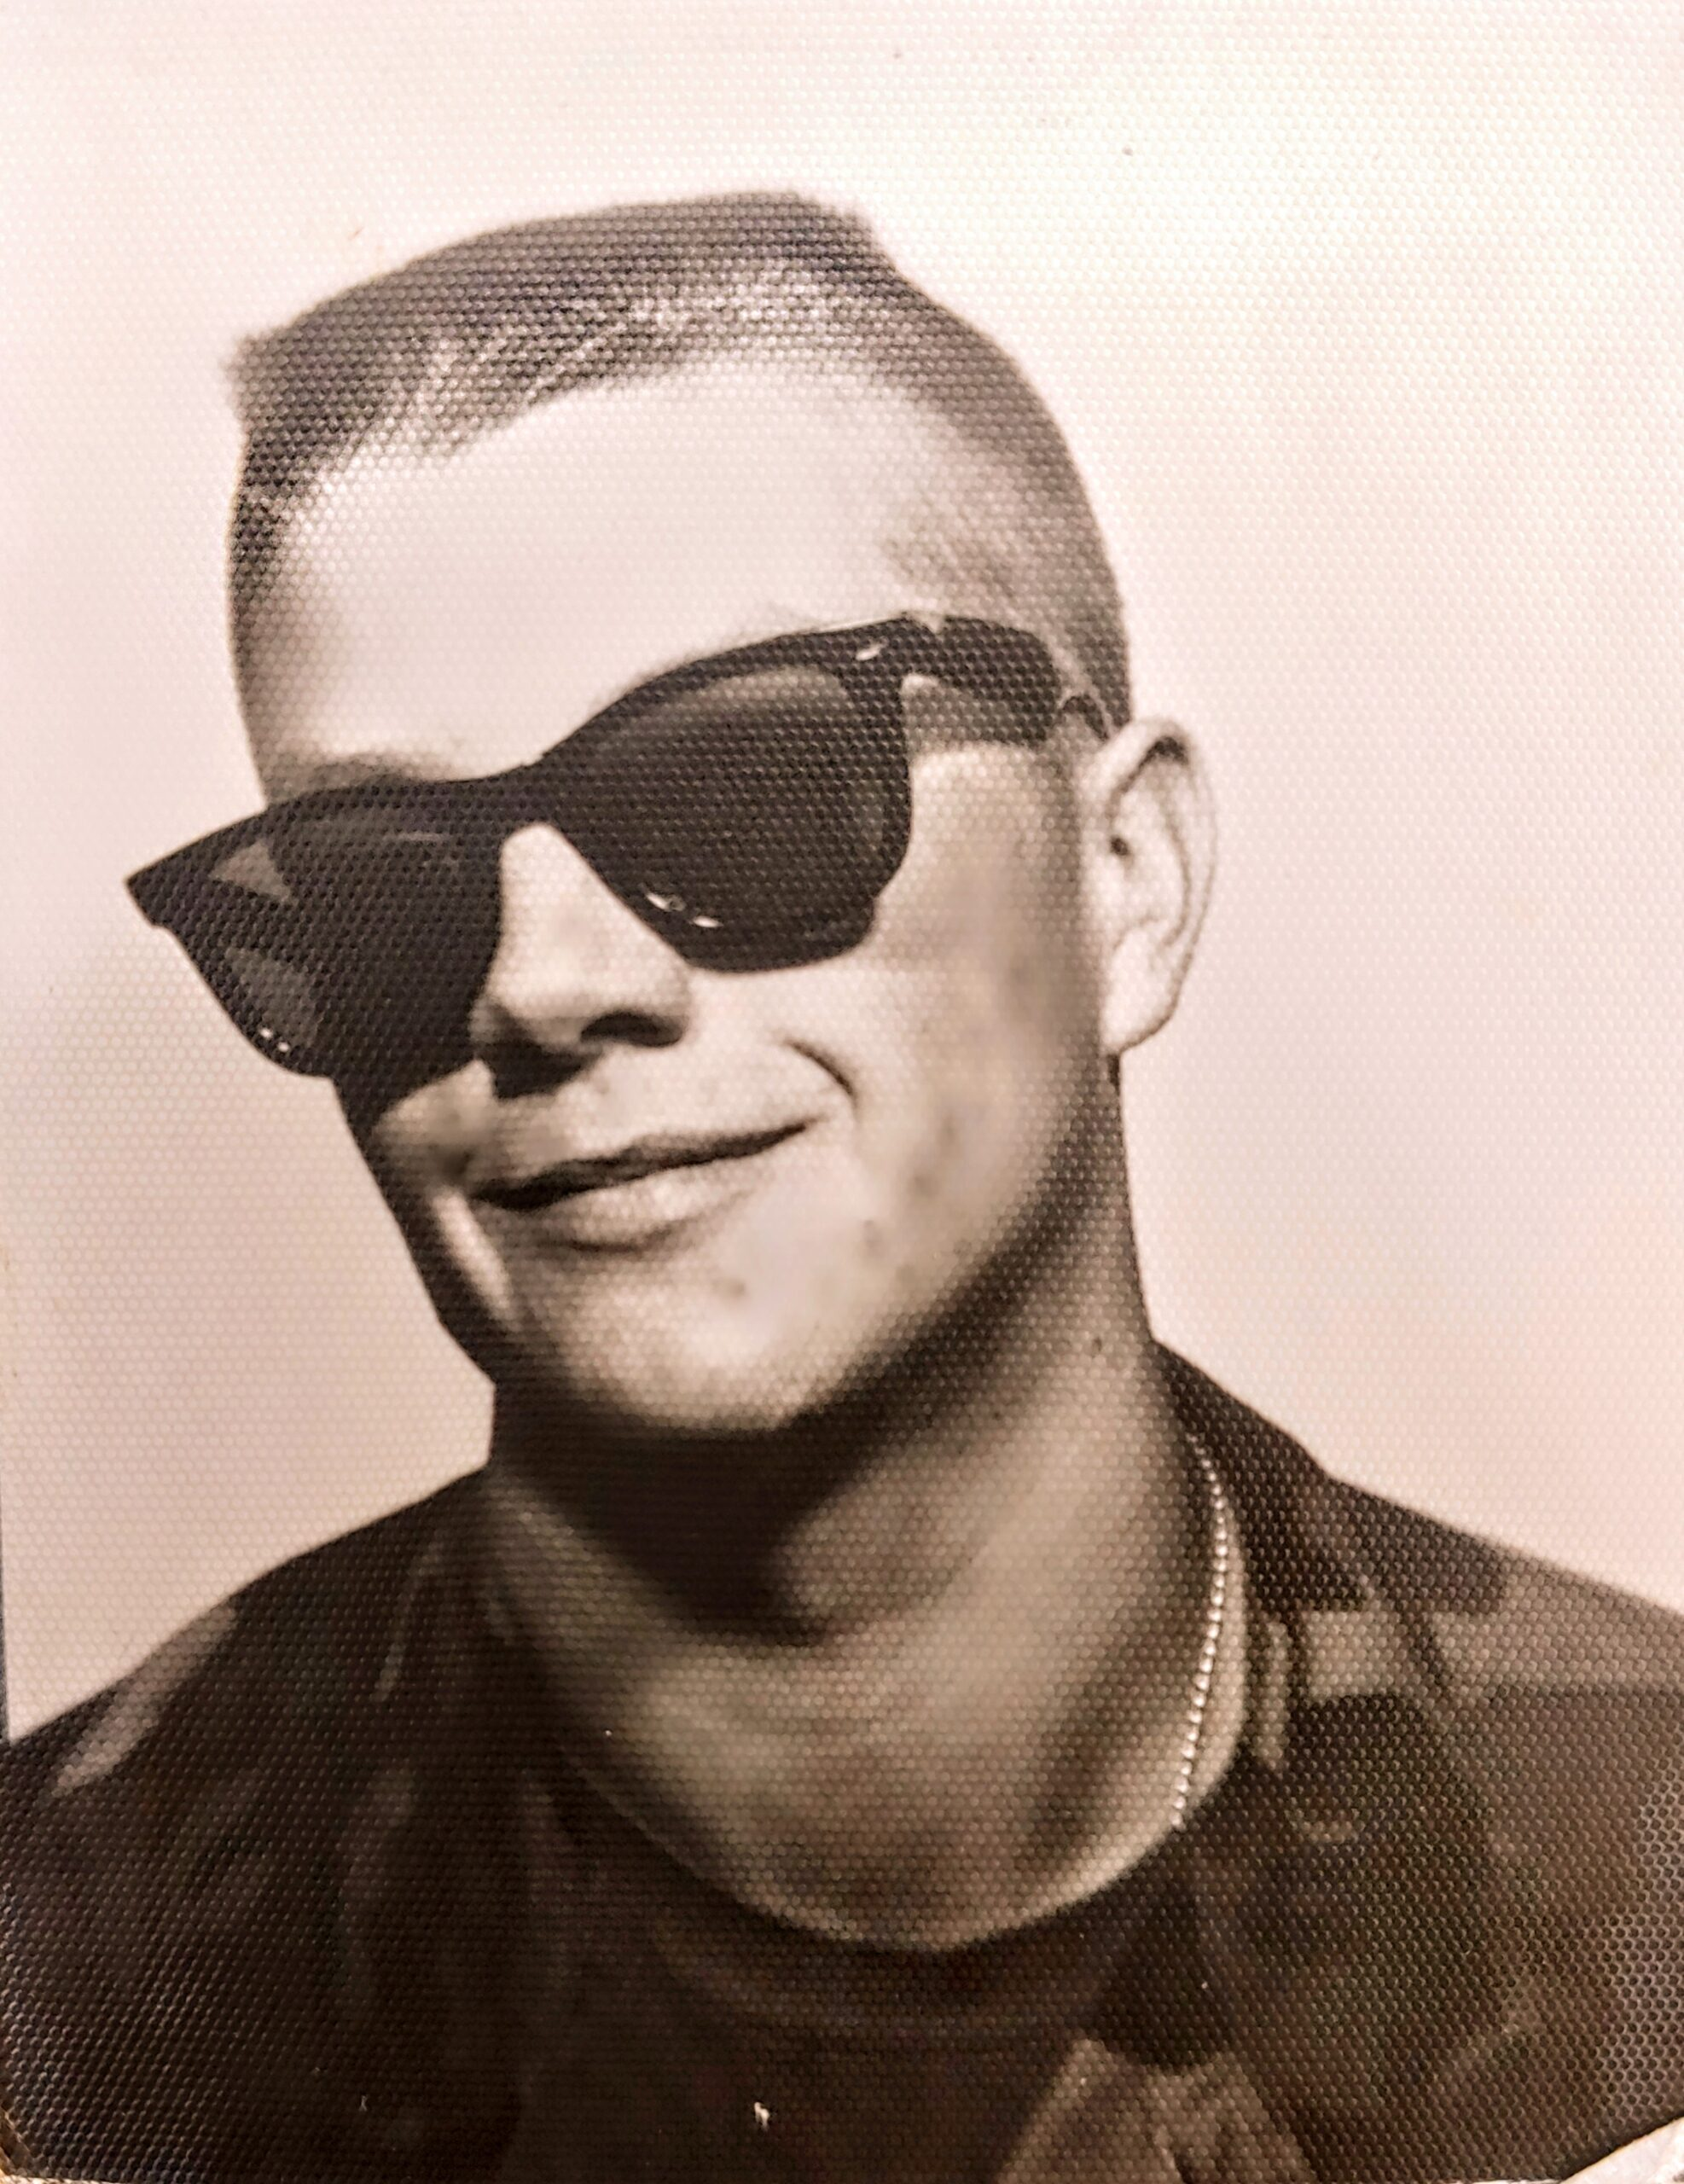 Daniel Smith wearing sunglasses